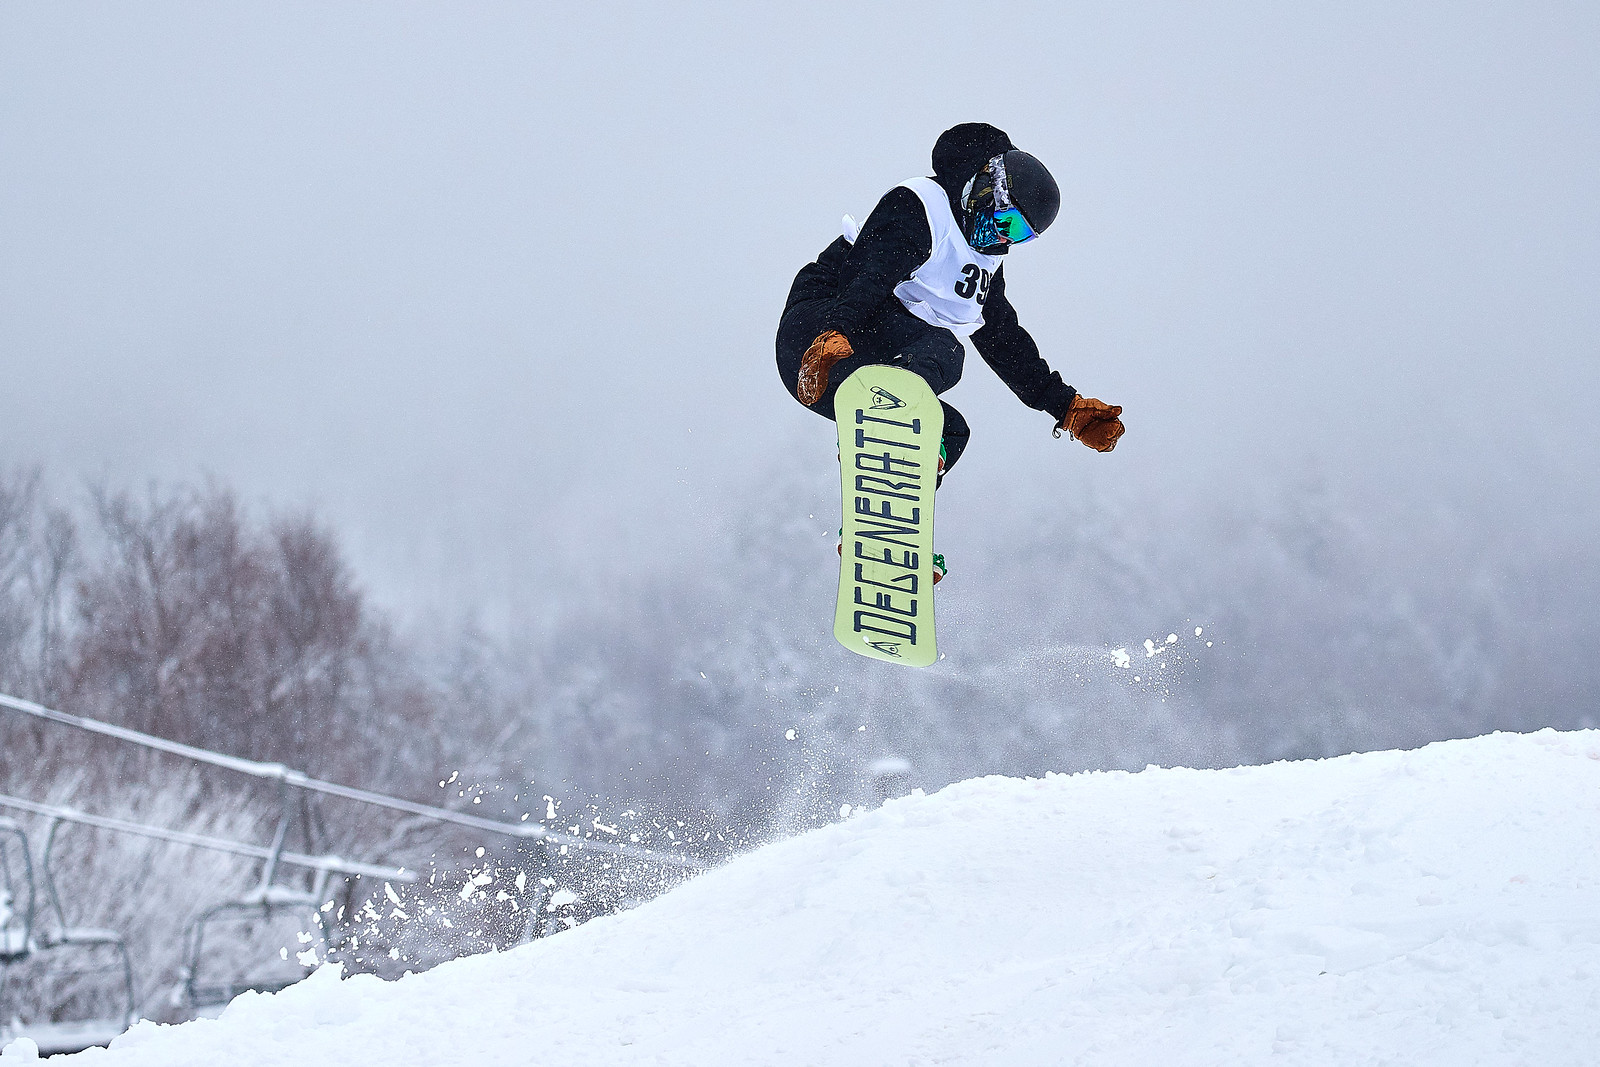 Ski Snowboarding -  6660 - 200-X3.jpg